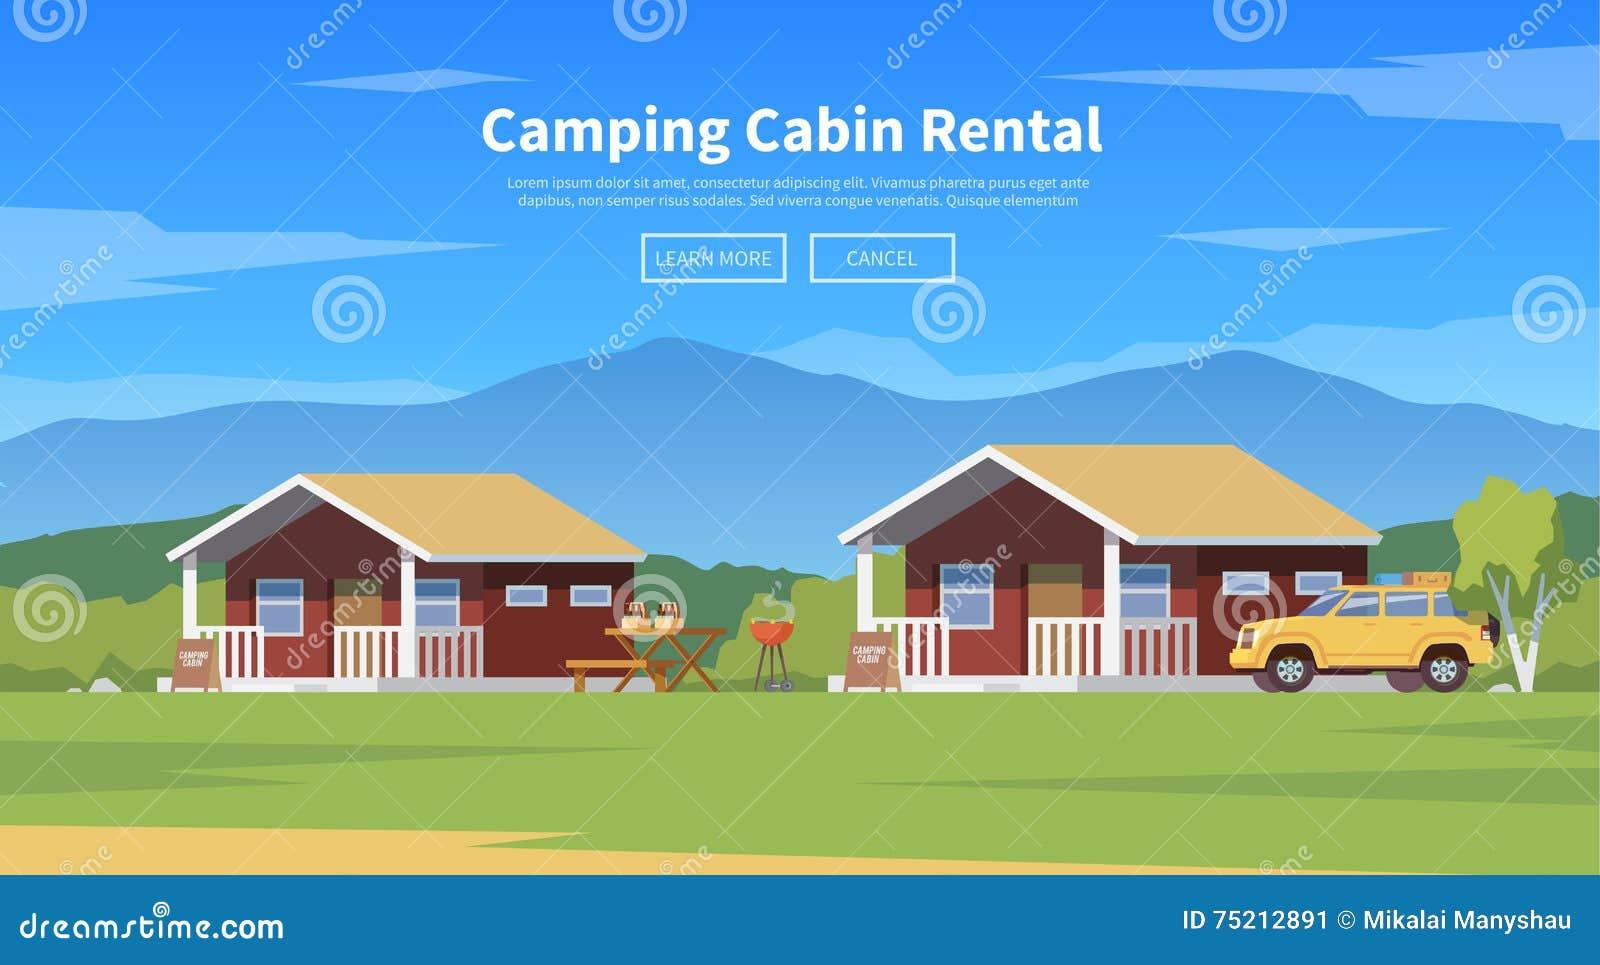 Camping Cabins  Vector Illustration  Stock Illustration